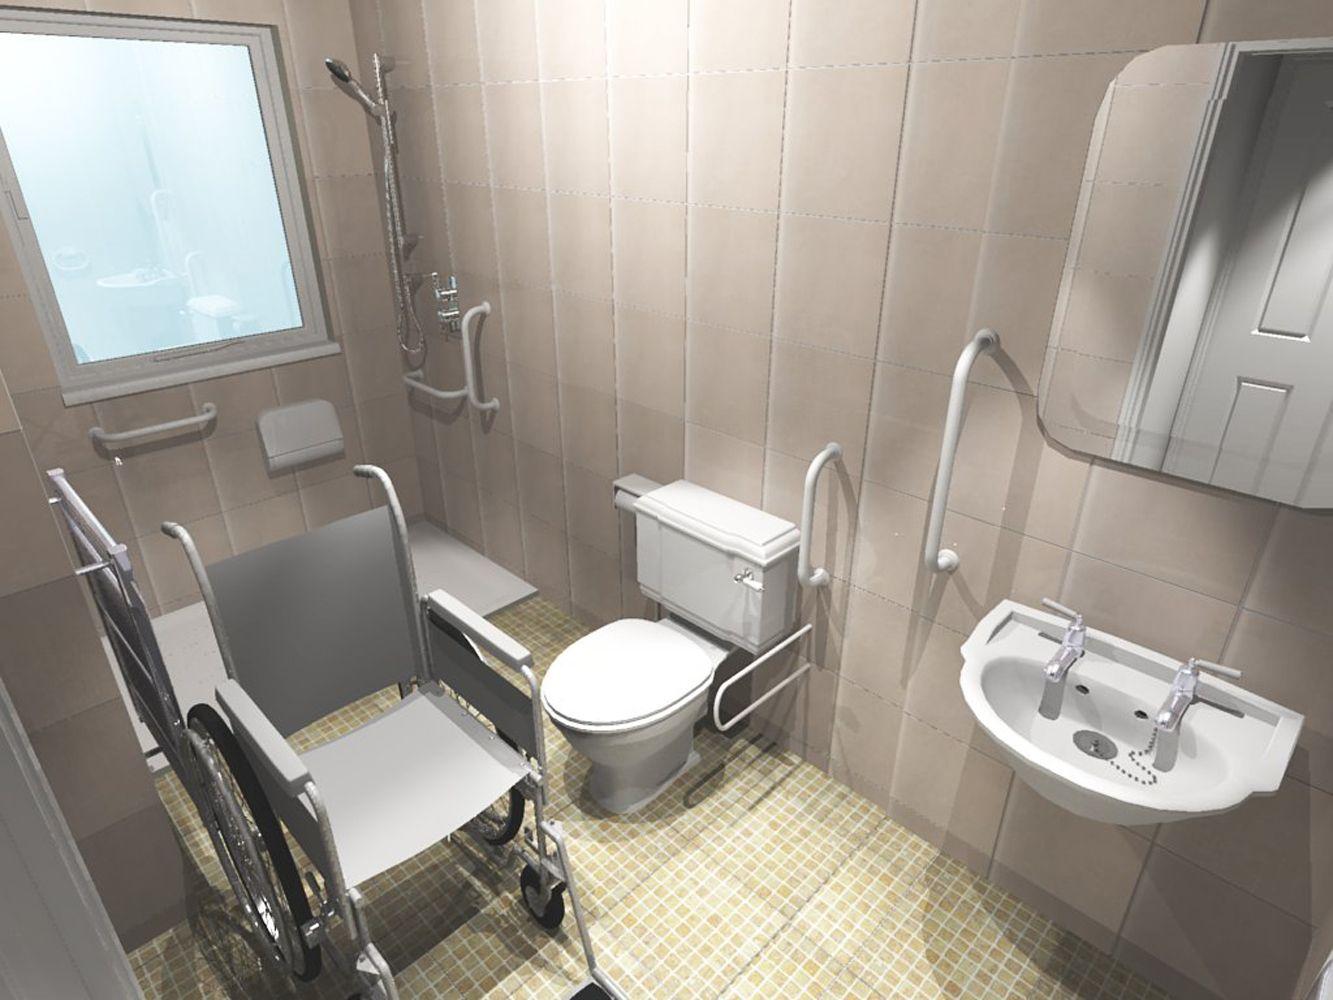 Best Kitchen Gallery: Handicap Bathroom For The Home Pinterest Handicap Bathroom of Handicap Bathrooms Designs  on rachelxblog.com